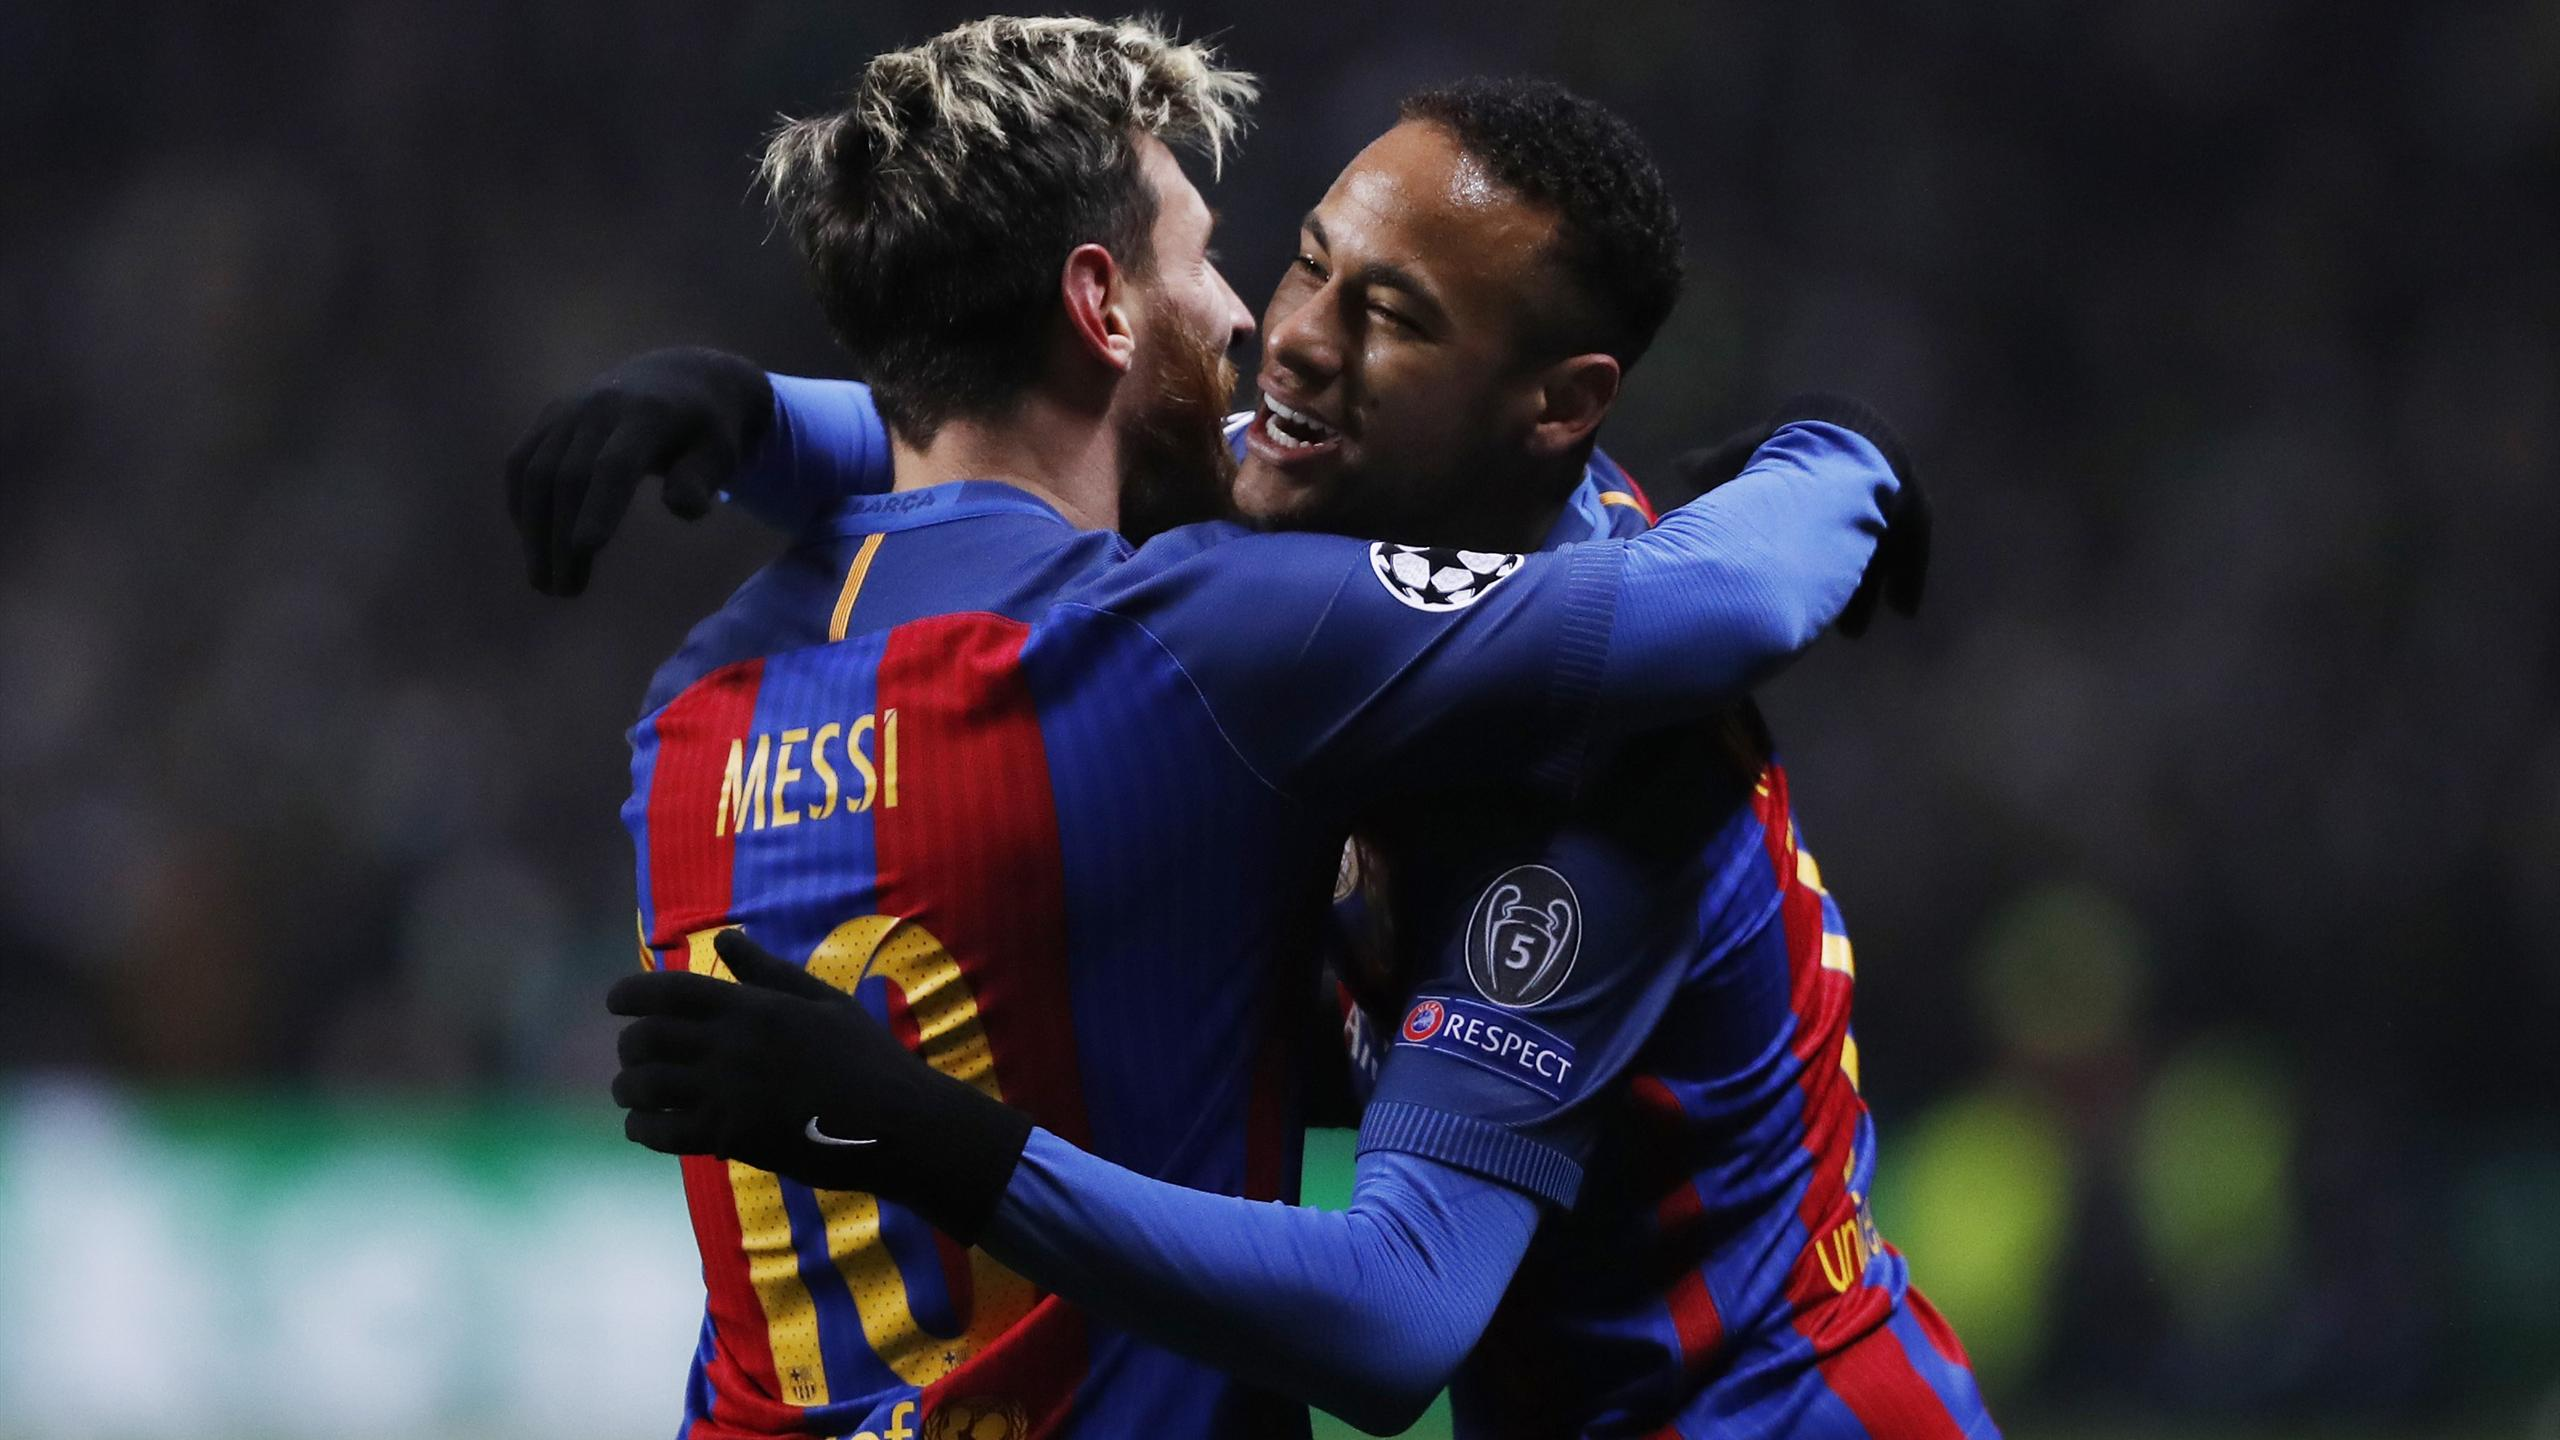 Lionel Messi and Neymar combine for brilliant opener.